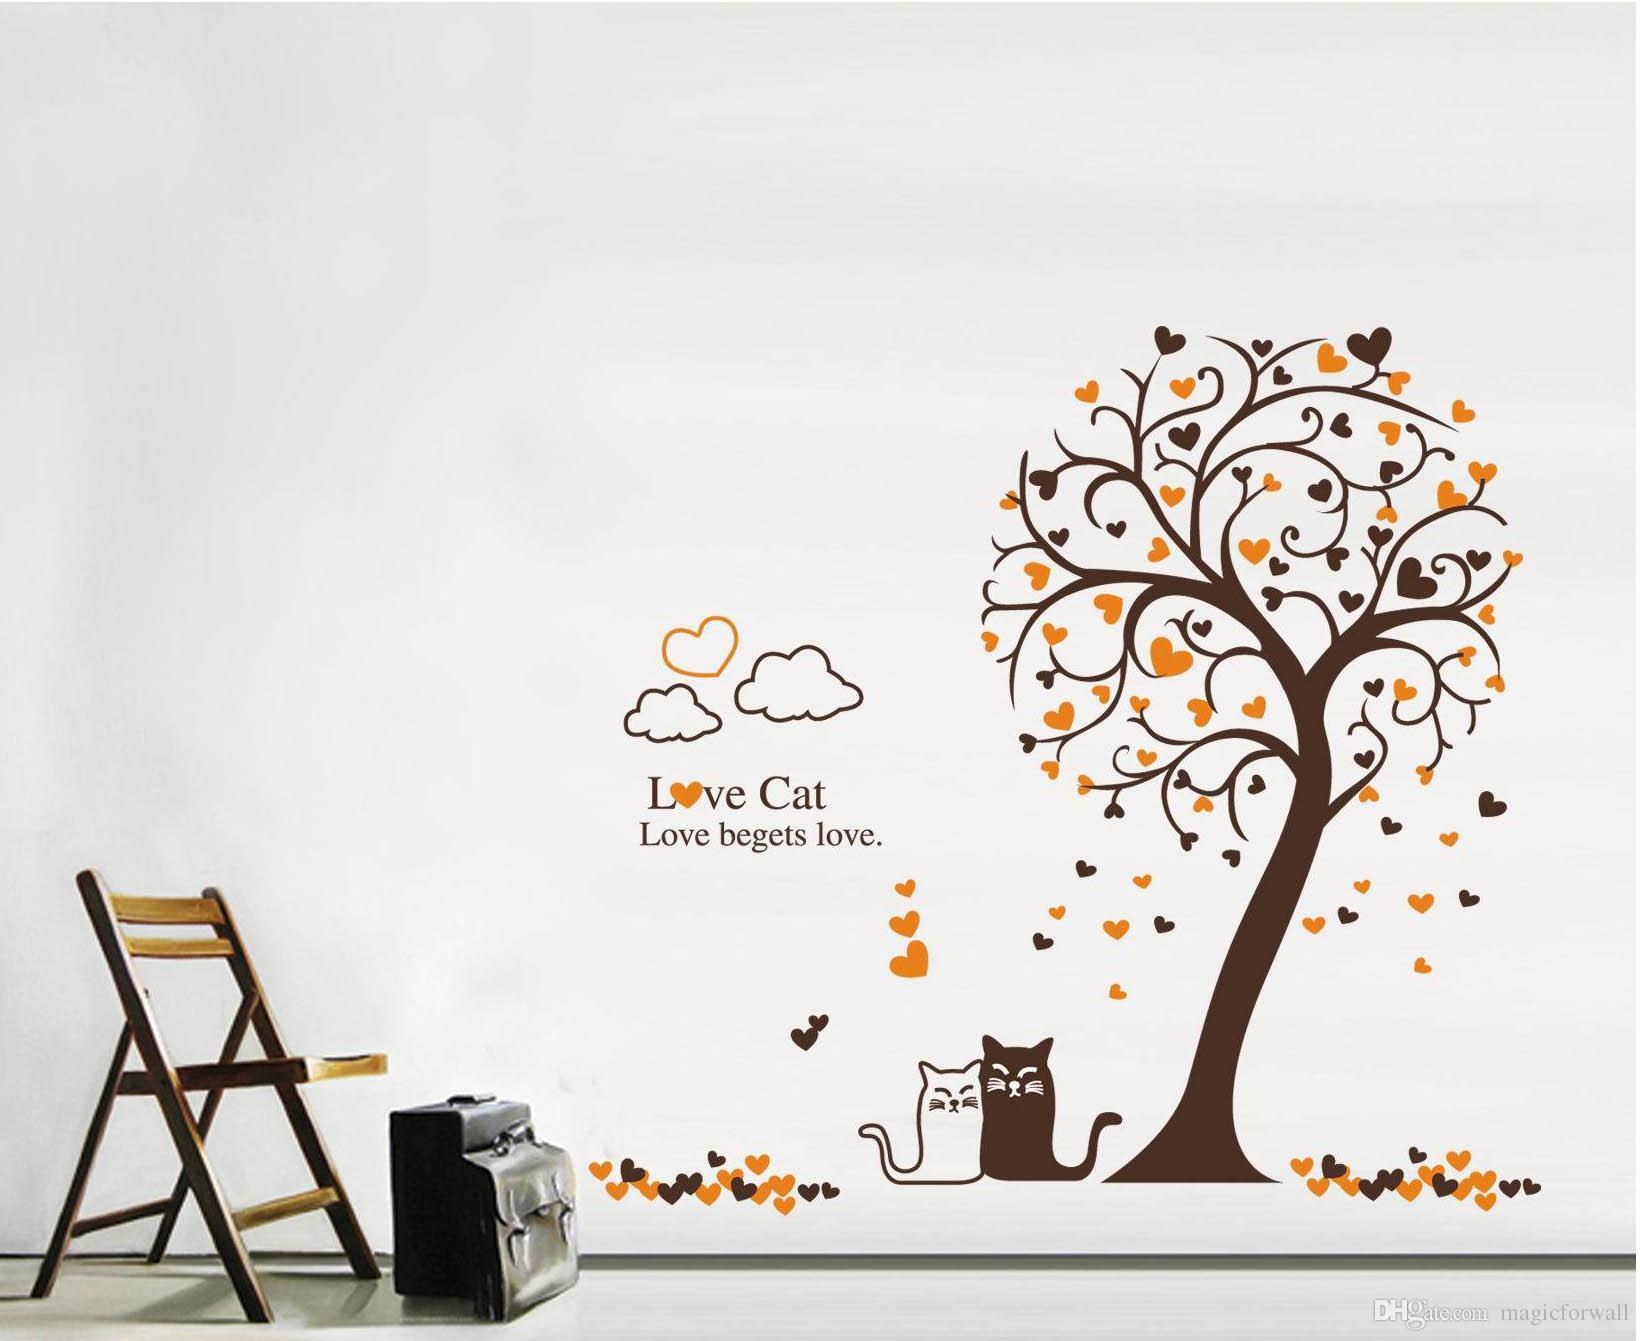 Cartoon Loving Cat under Tree Wall Art Mural Decor Removable PVC Art Decal Living Room Sofa Background Wallpaper Decoration